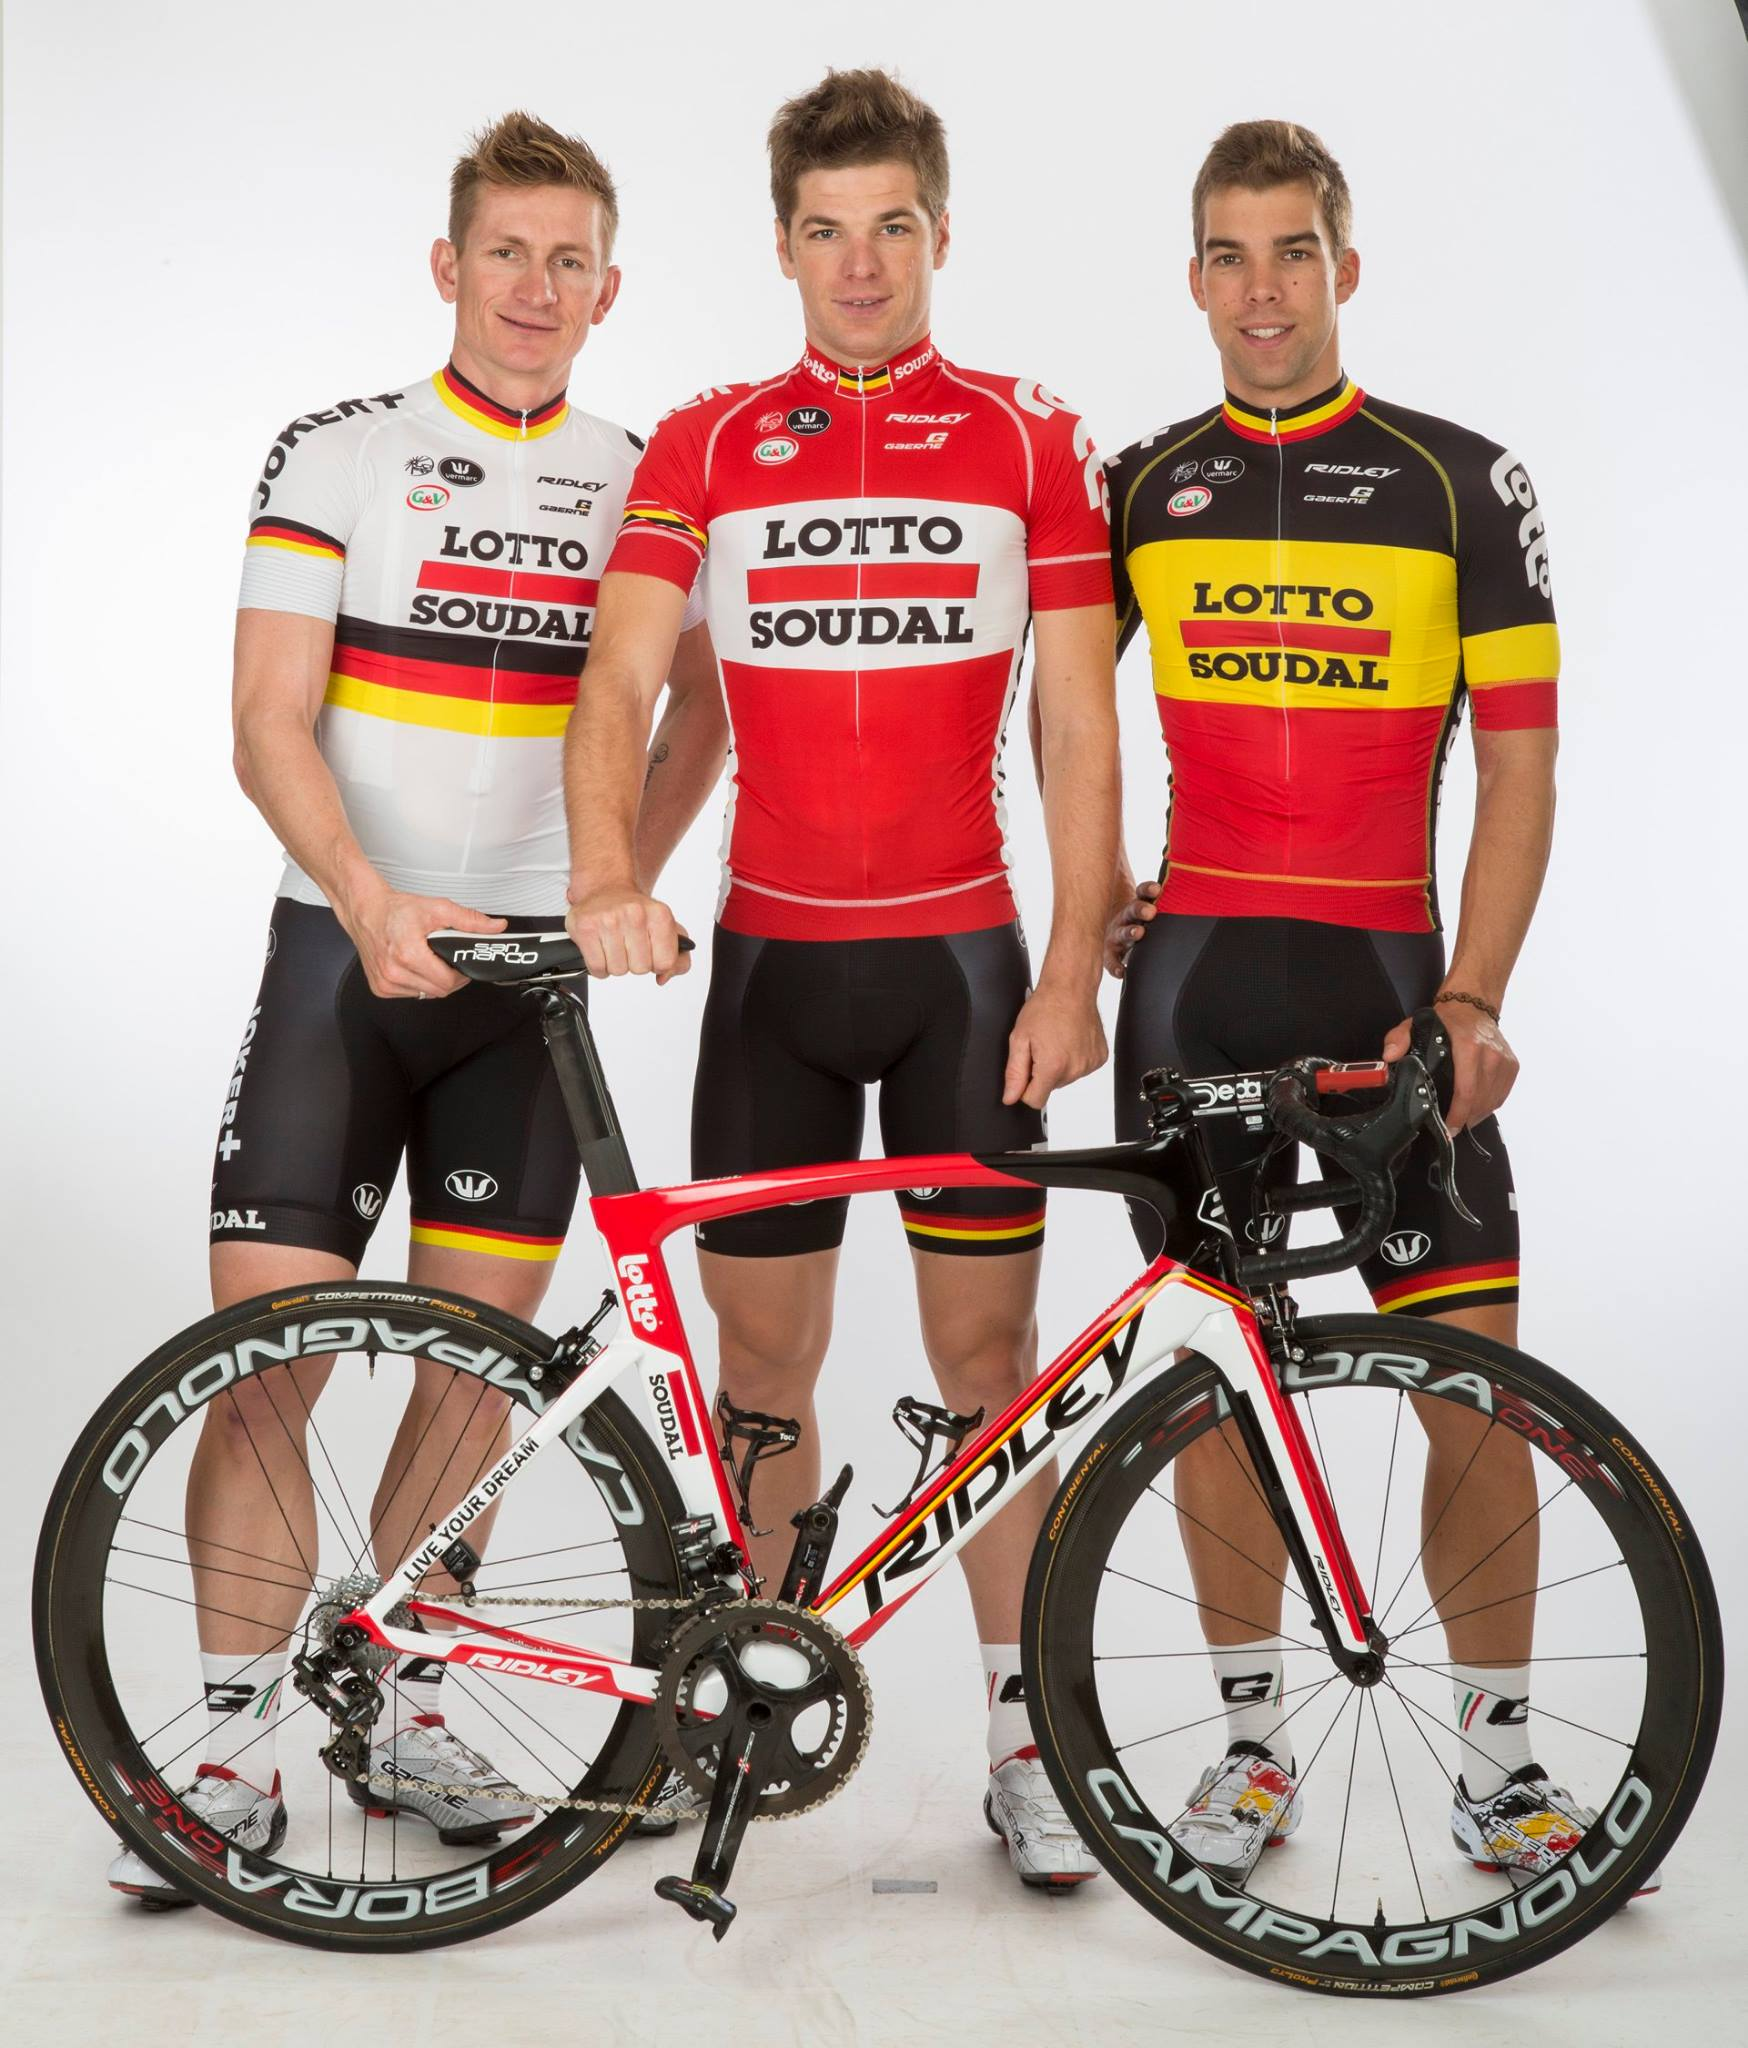 Team Lotto Soudal